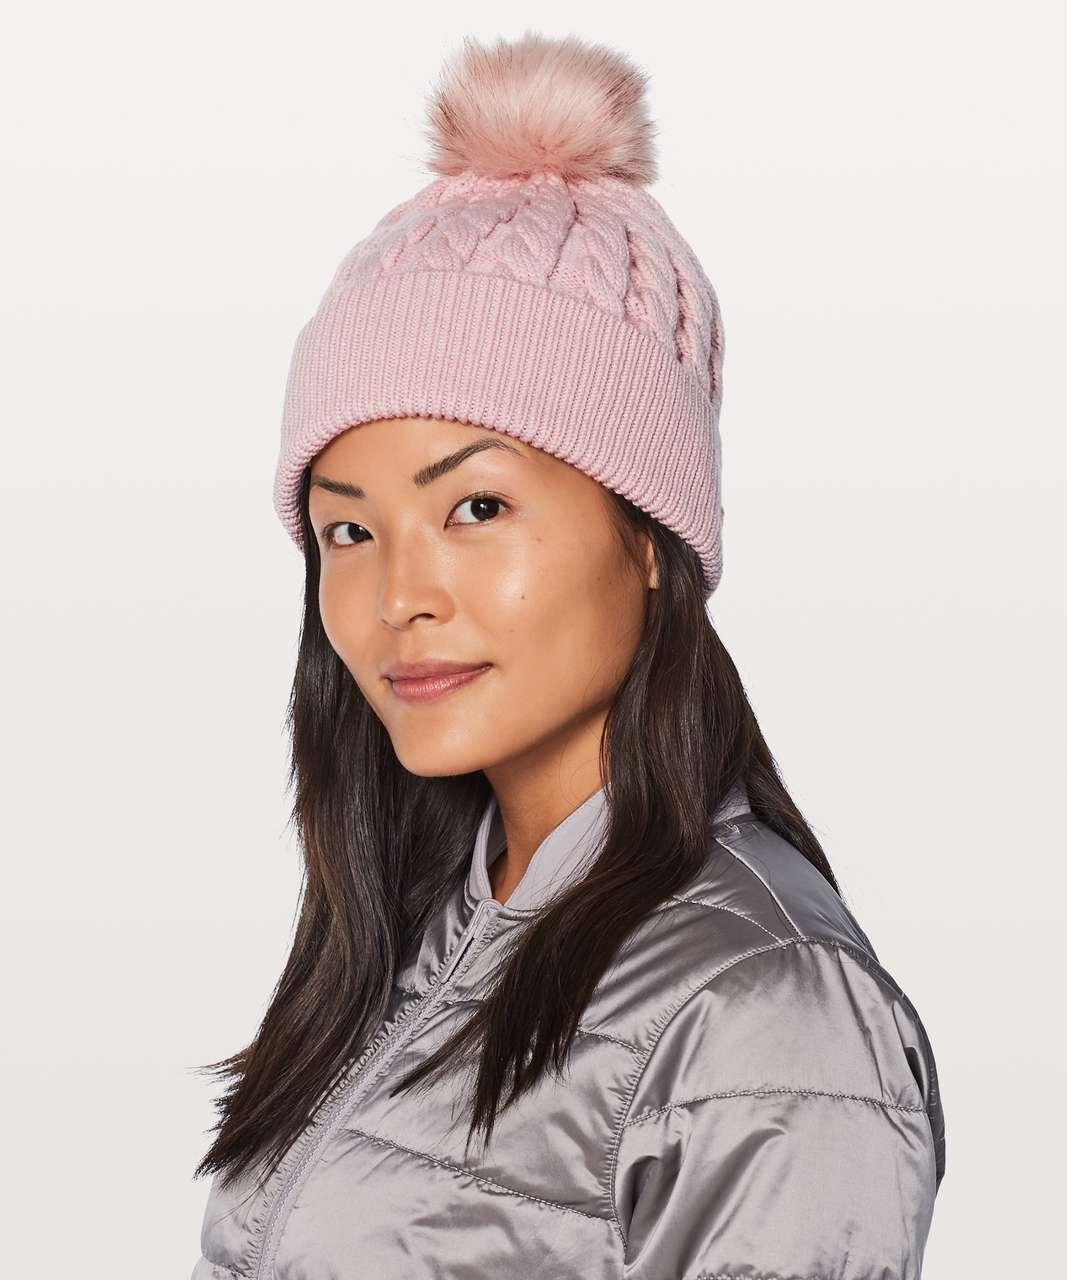 a6237b2c463 Lululemon Wool Be Toasty Toque - Misty Pink - lulu fanatics